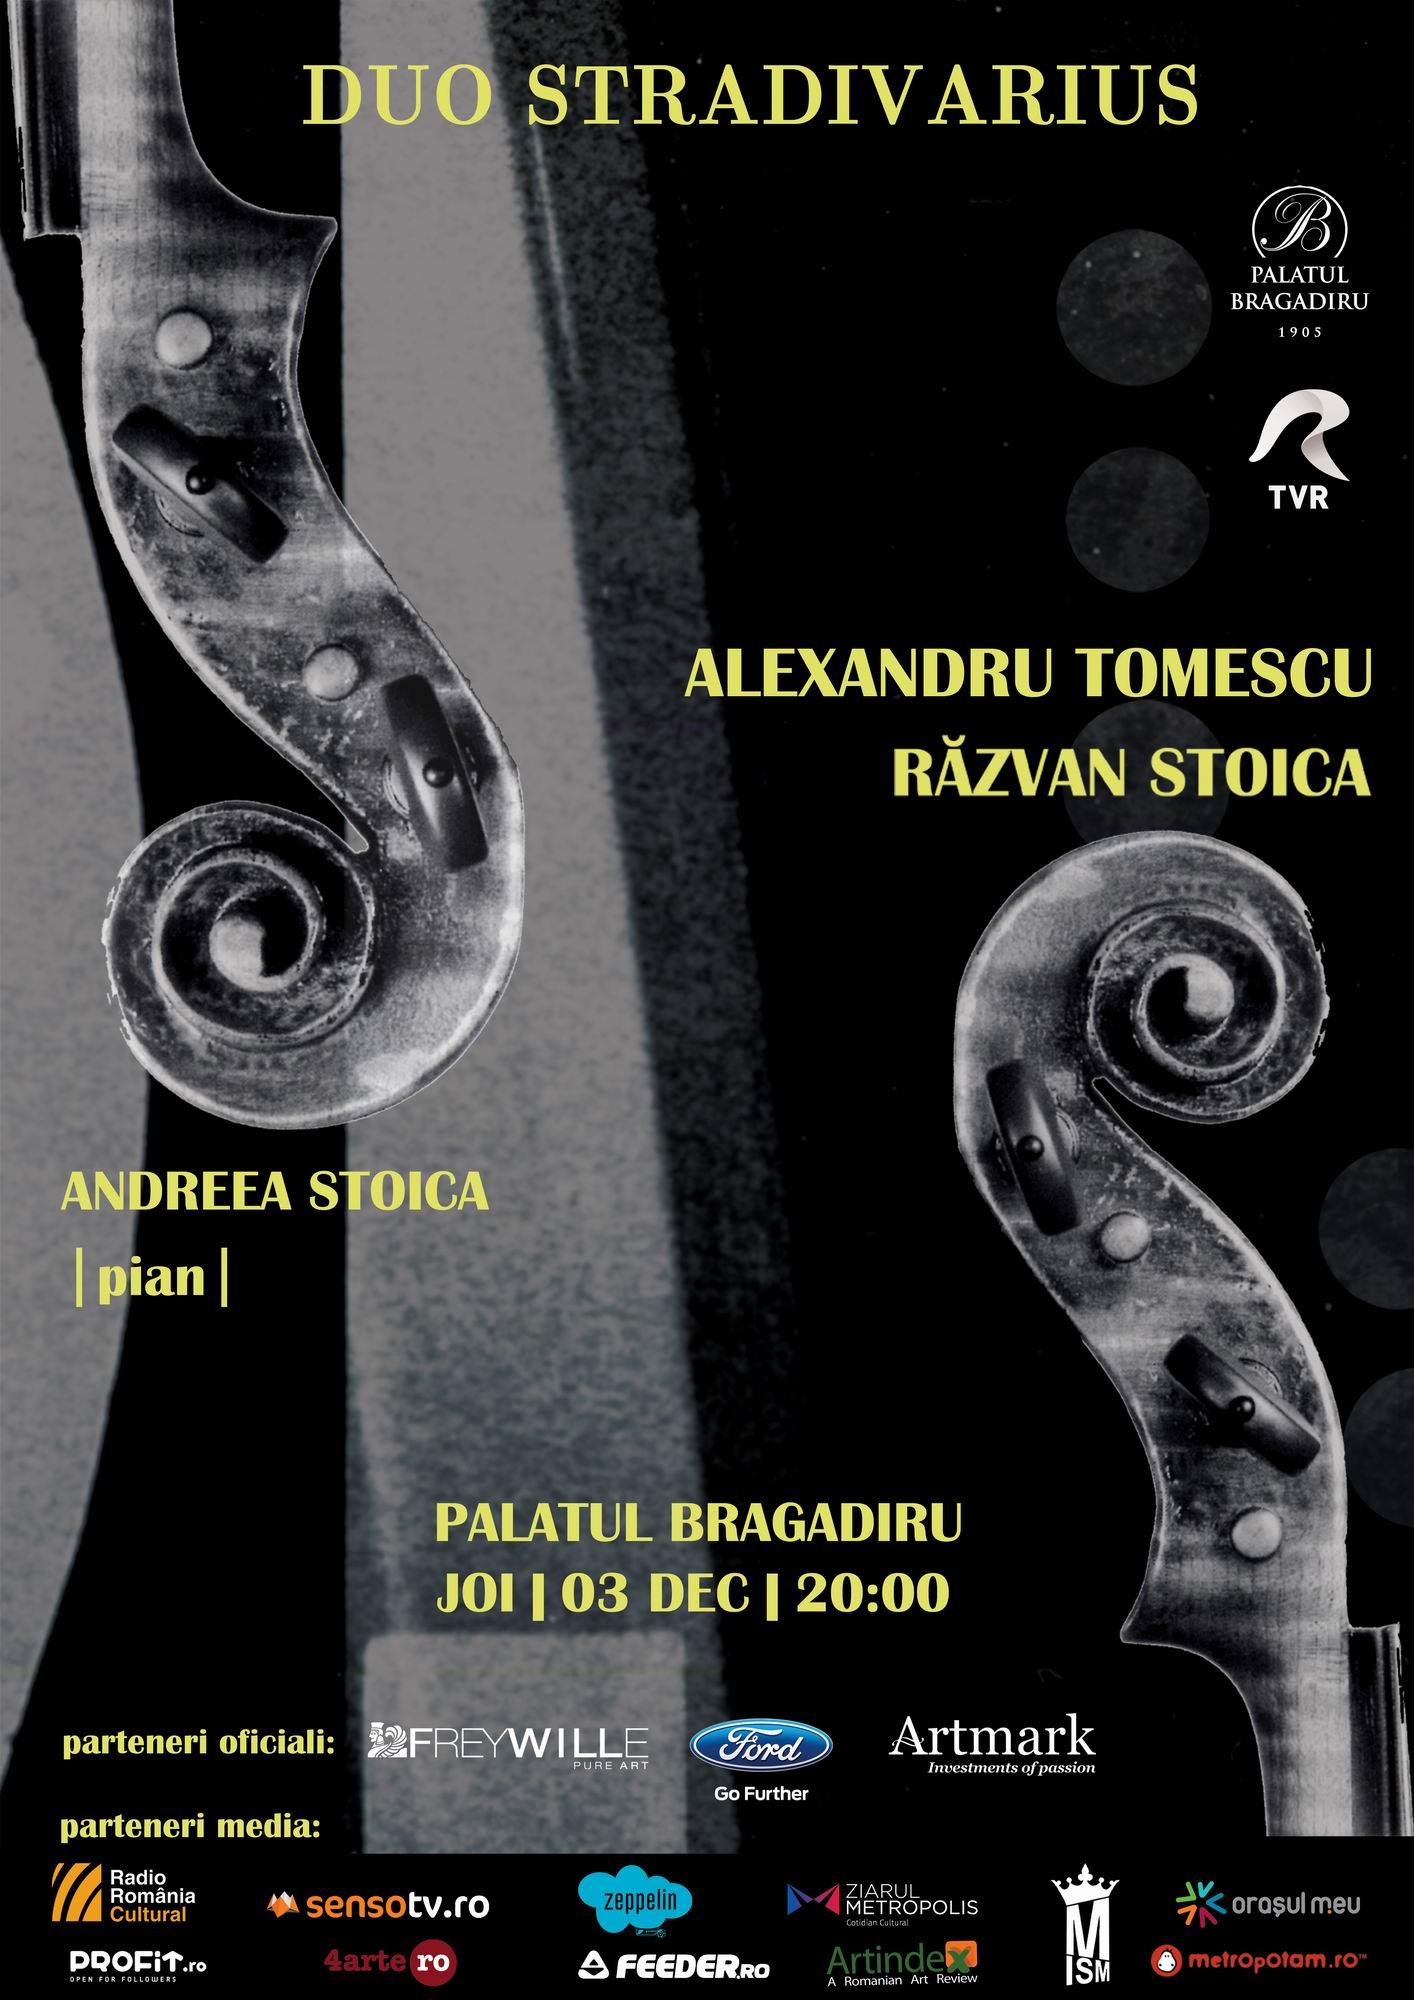 DUO STRADIVARIUS – Alexandru Tomescu și Răzvan Stoica